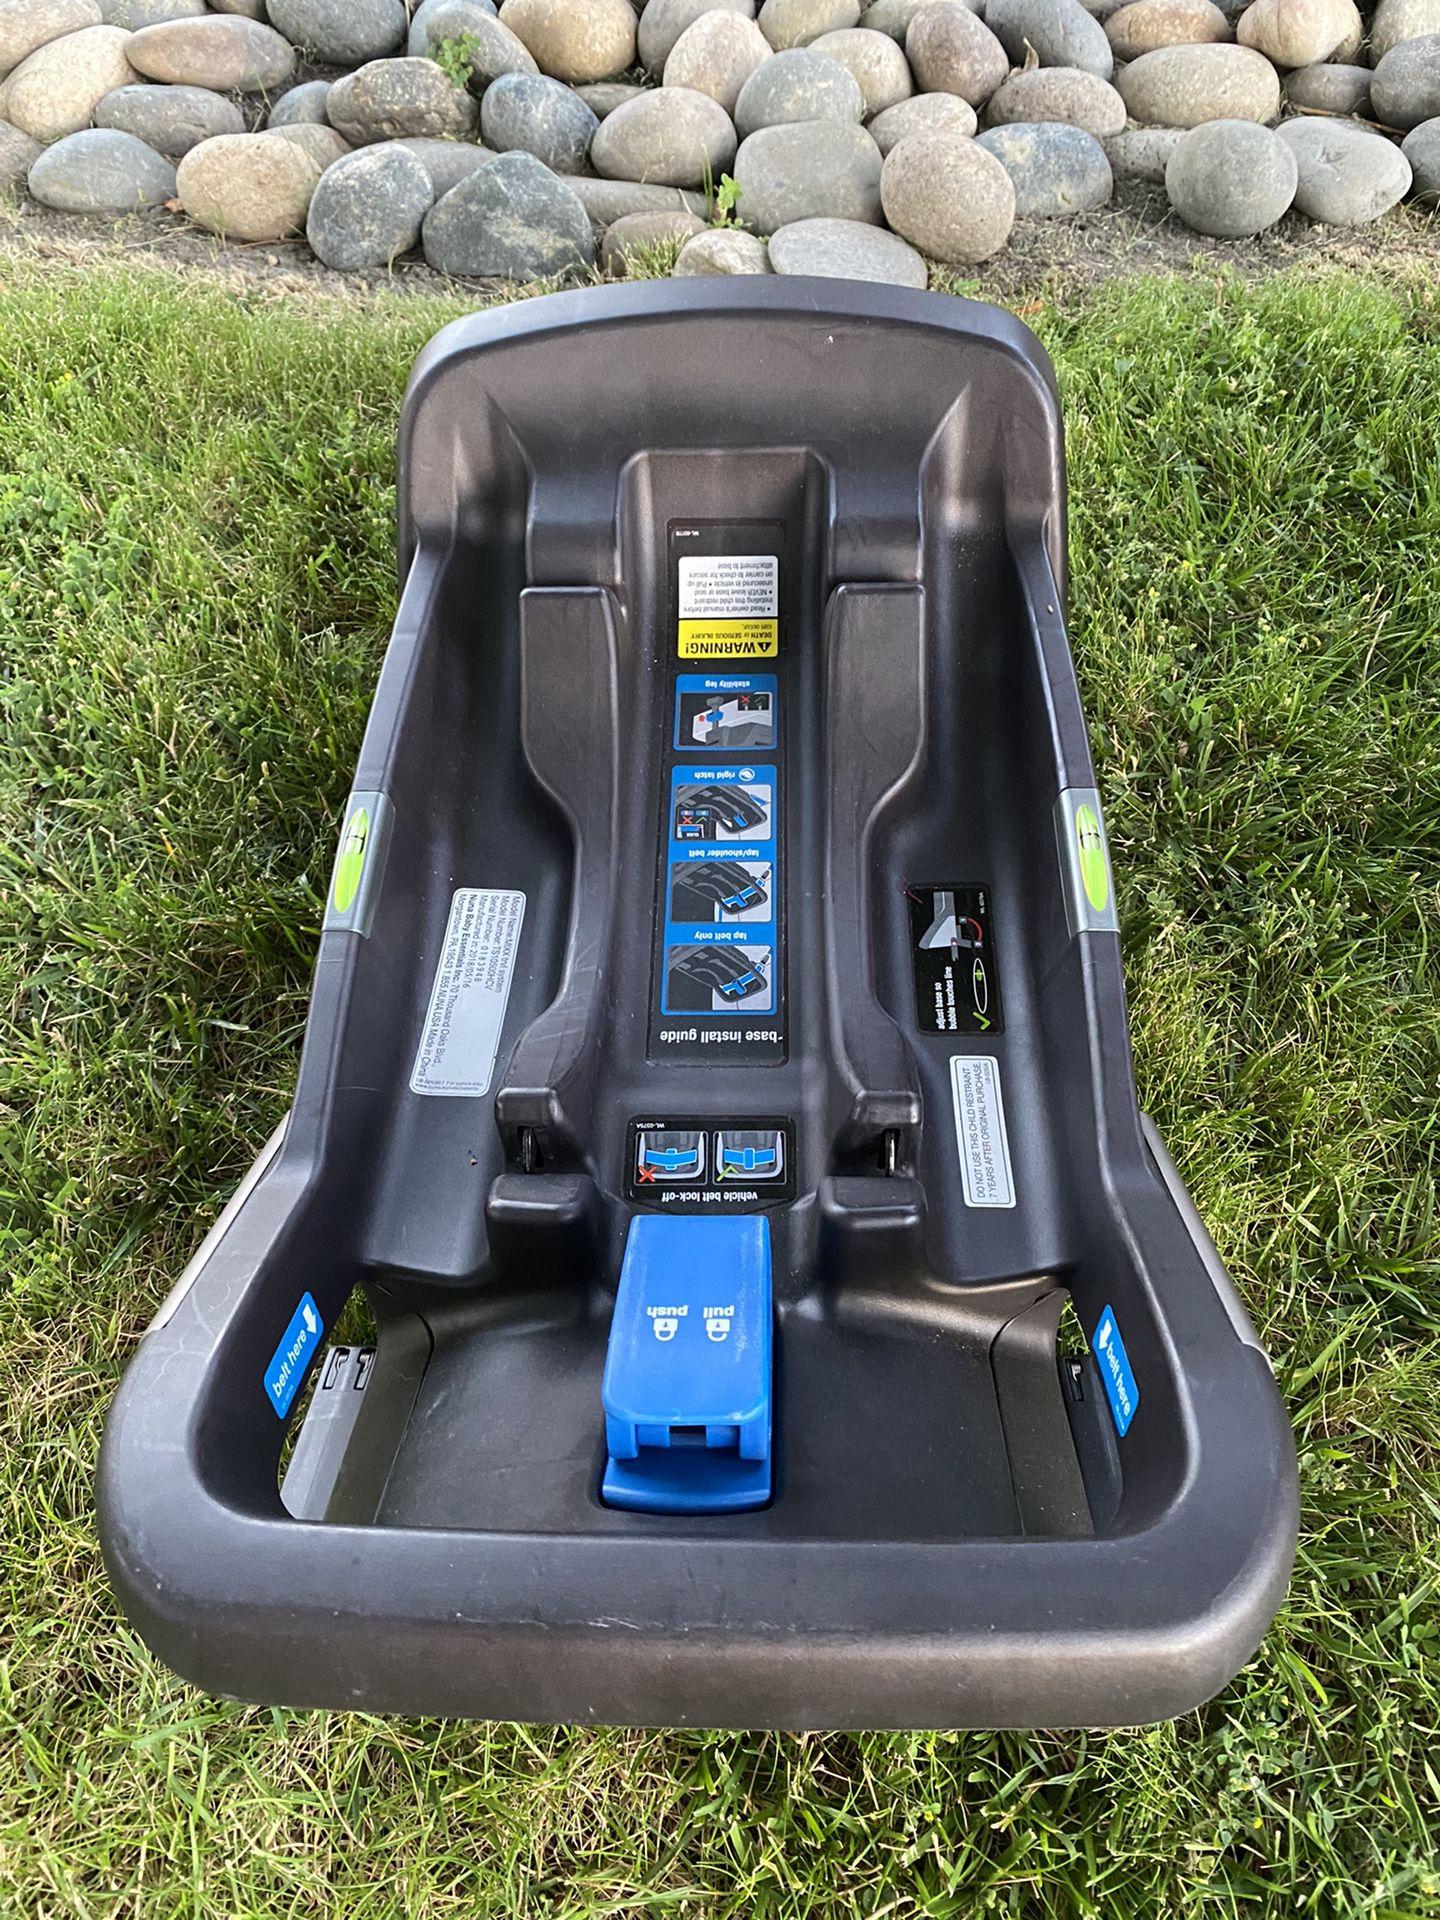 Nuna Mixx Stroller With Car Seat